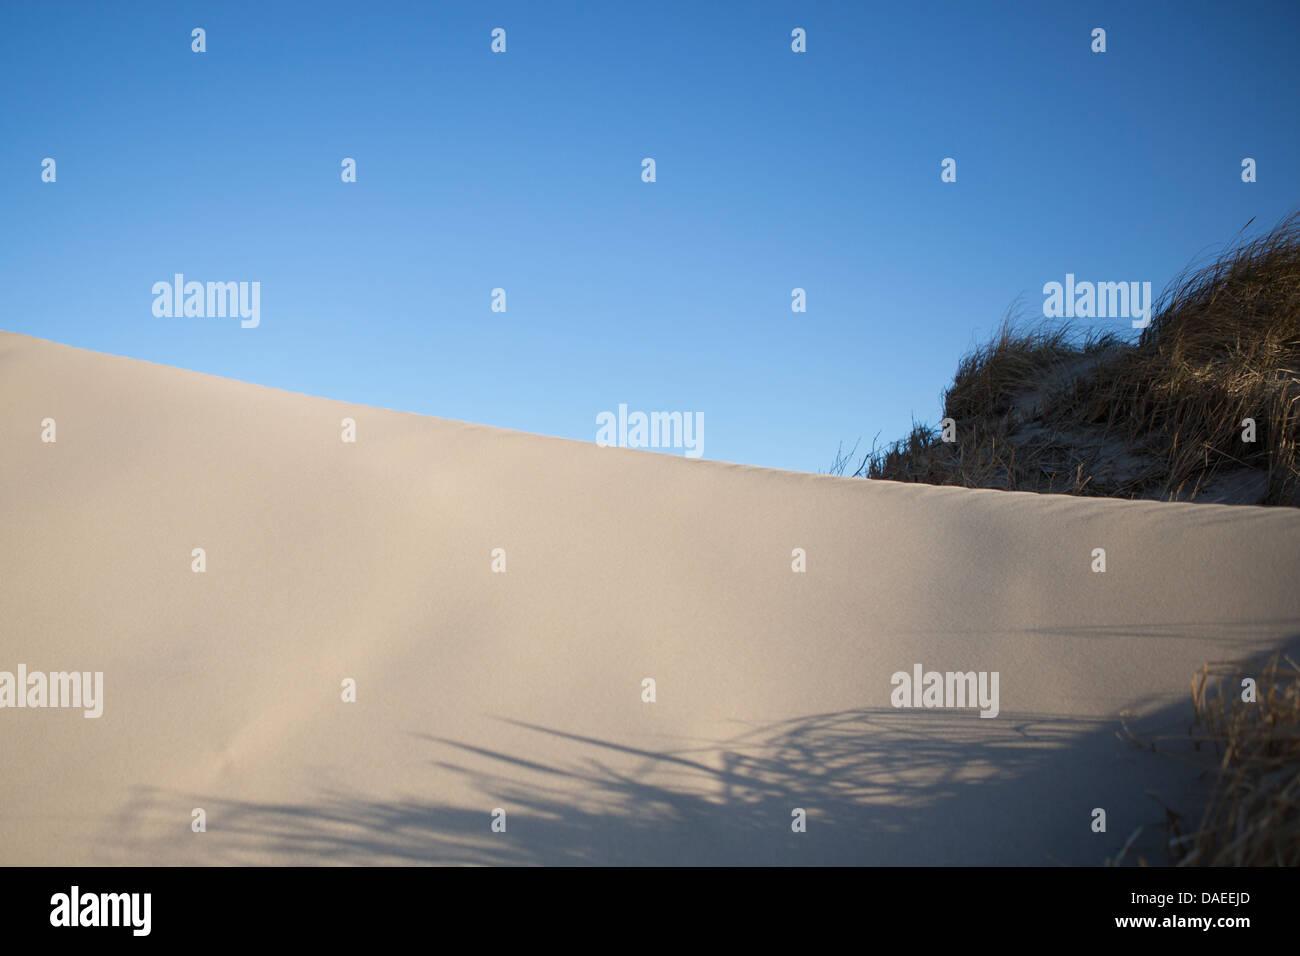 Una duna de arena, cielos azules, algunos vegitation Foto de stock